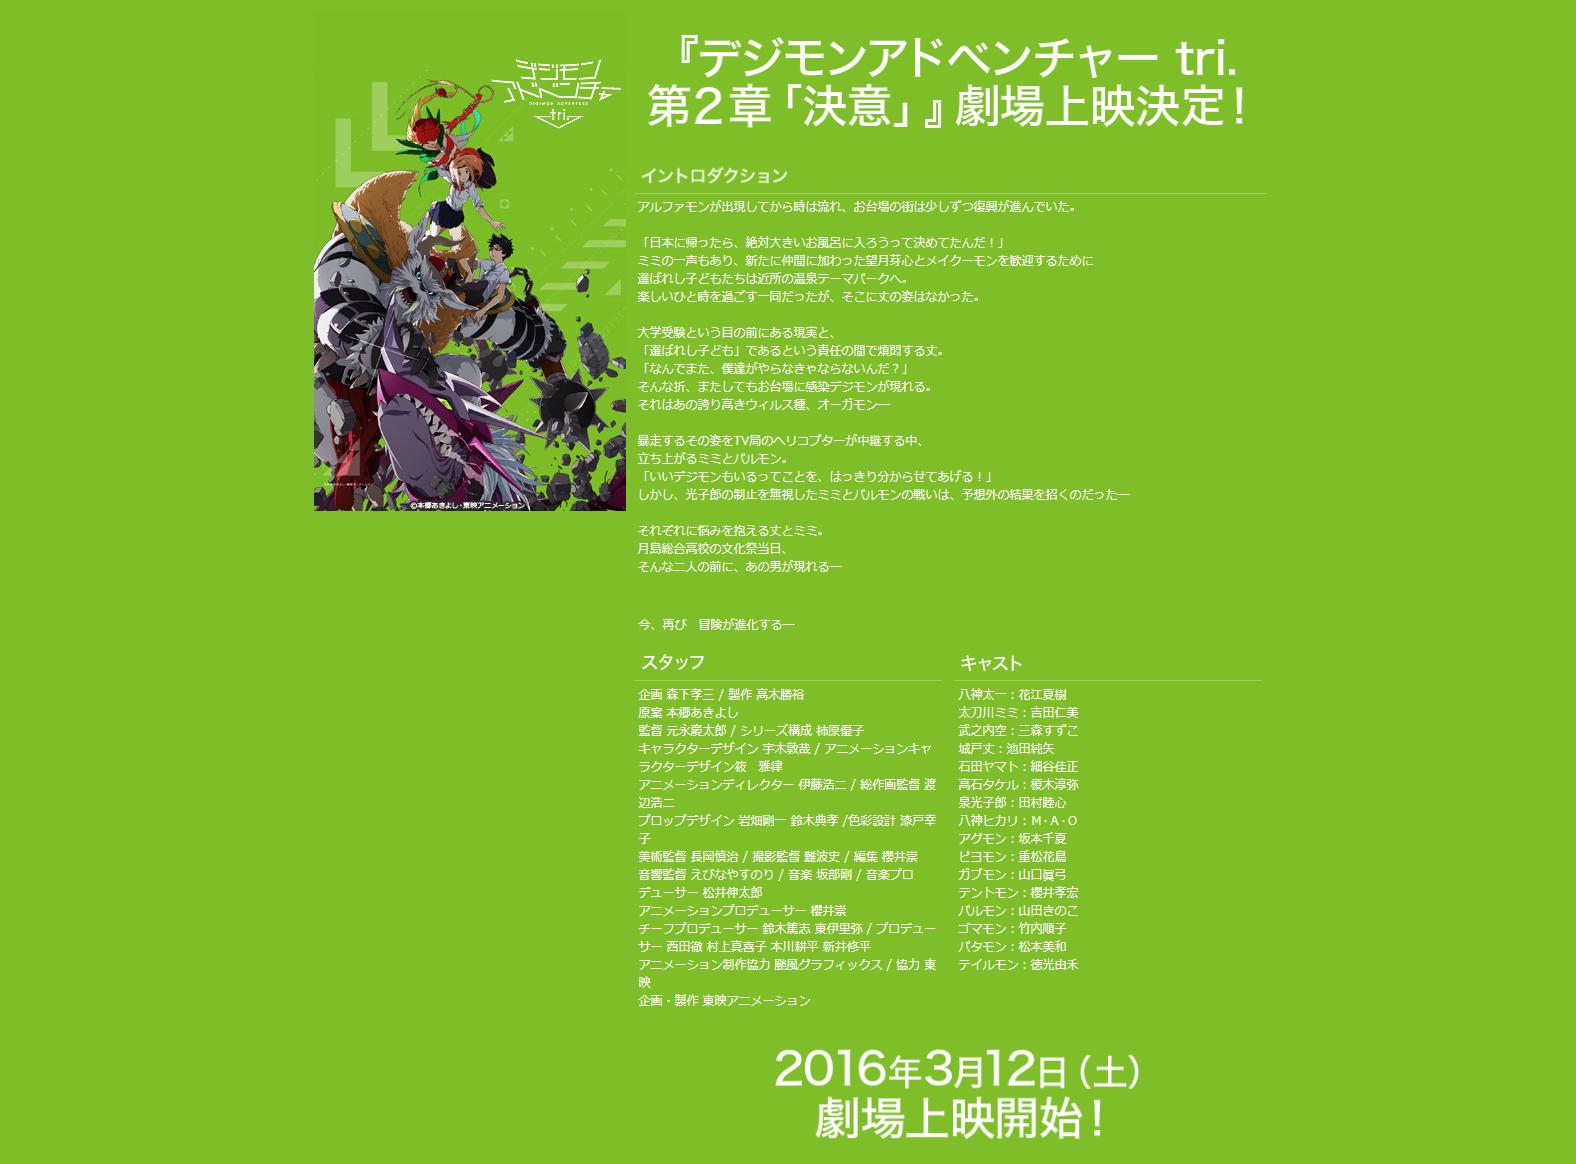 Introduction de Ketsui + Ventes de Tri + figurines